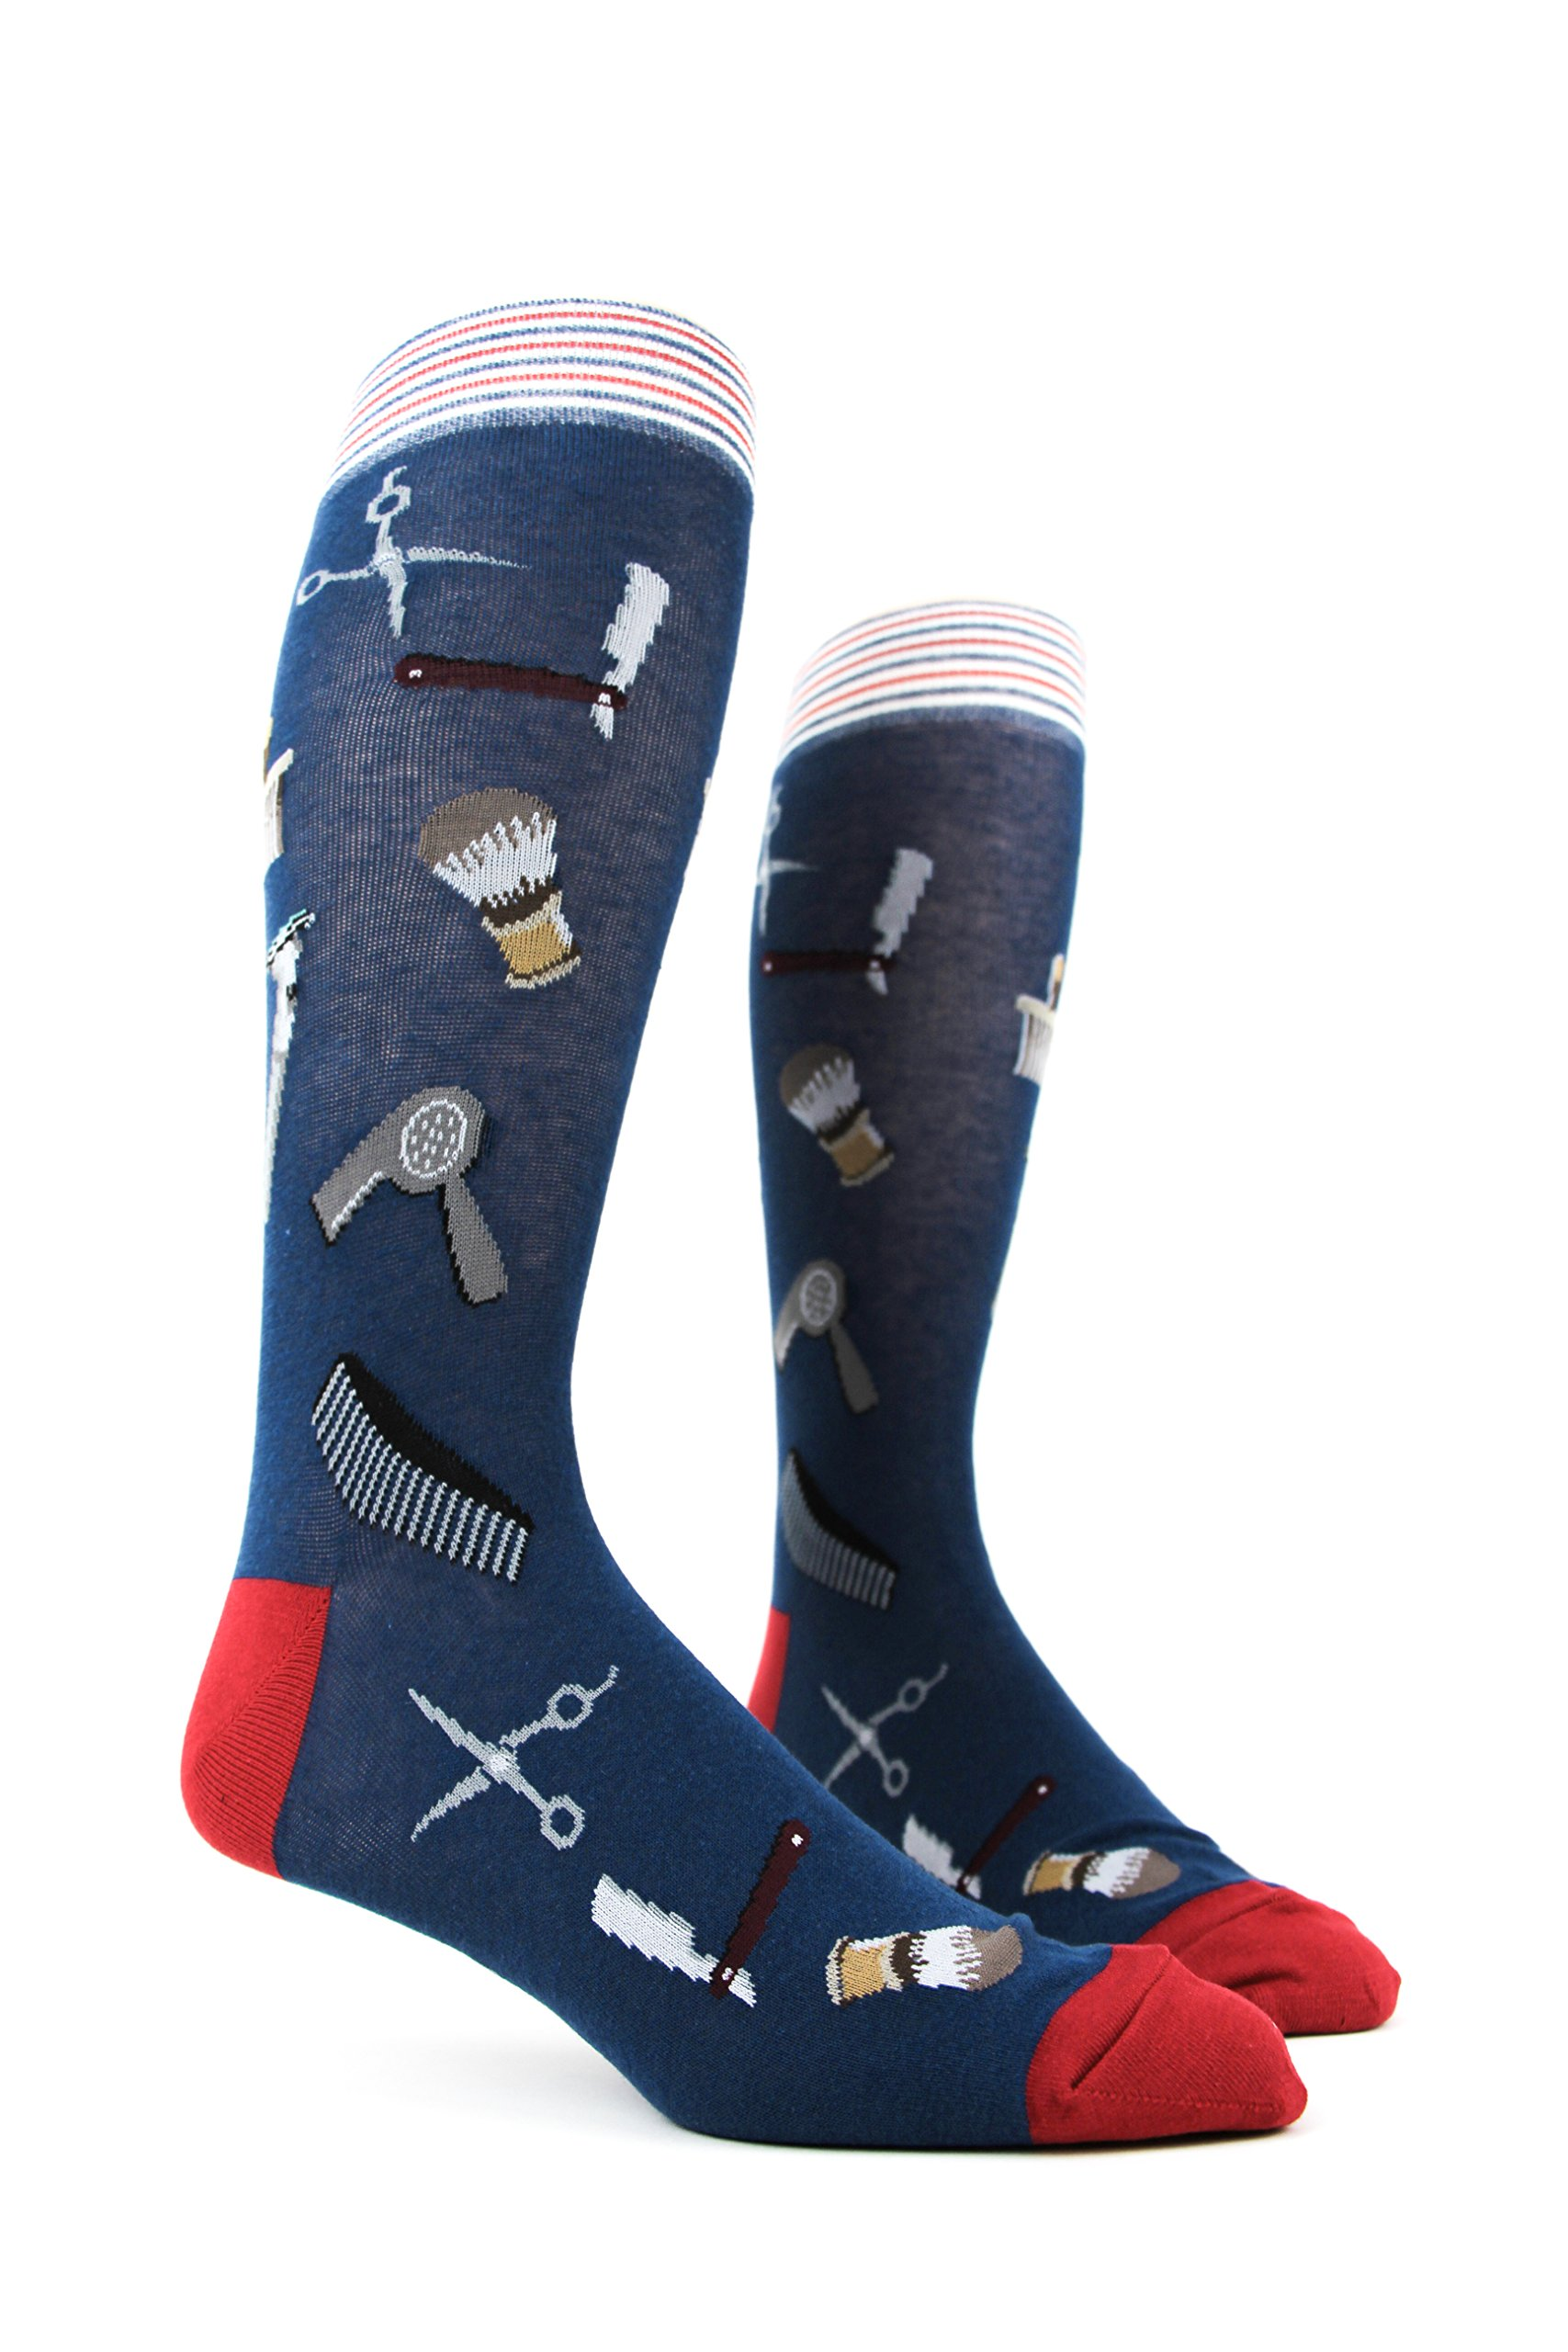 Foot-Traffic-Mens-Special-Interest-Socks-Fits-Mens-Shoe-sizes-7-12